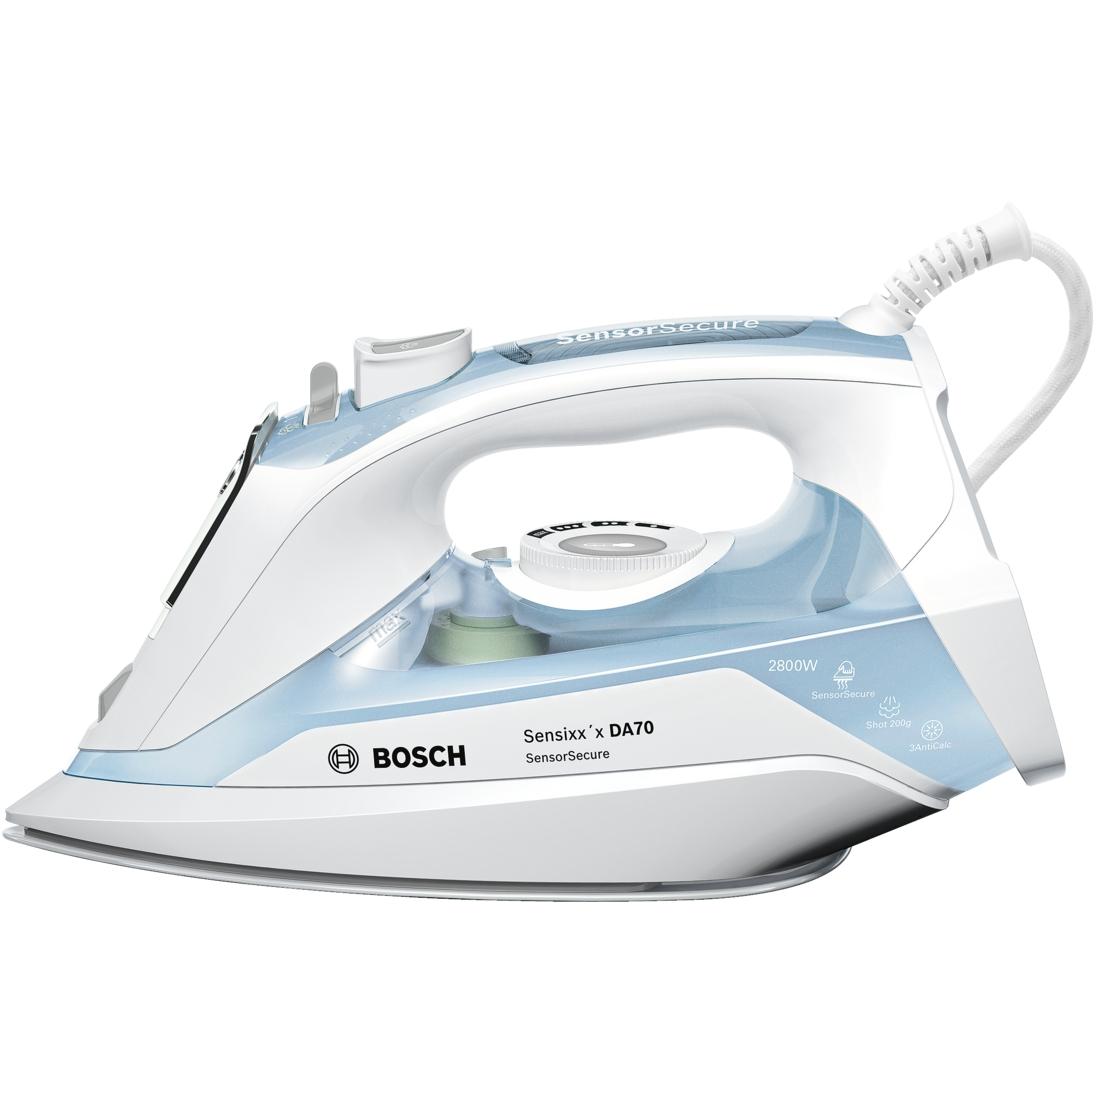 Fier de calcat Bosch Sensixxx DA70 SensorSecure TDA7028210 2800W Capacitate 380ml Alb/Albastru